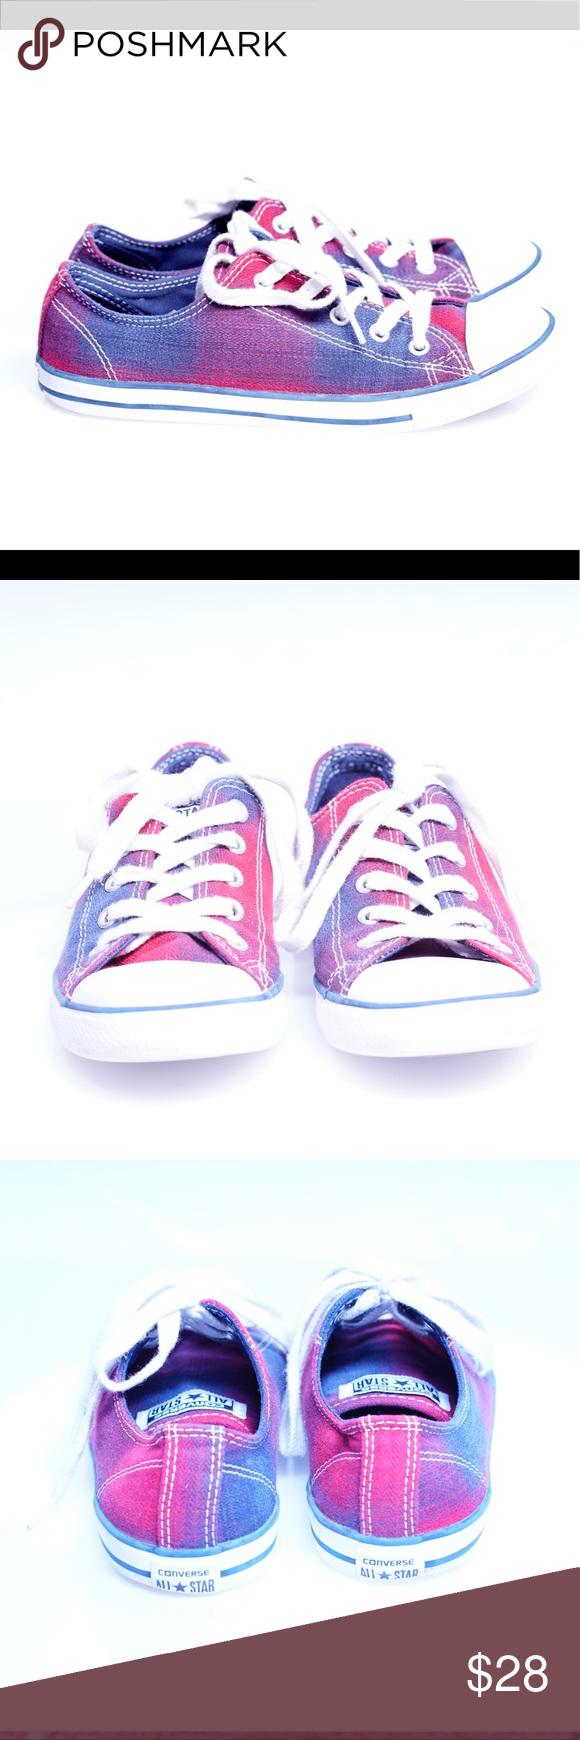 e7a6338efde0 Converse all star girls sneakers size 6! Converse all star girls sneakers size  6!